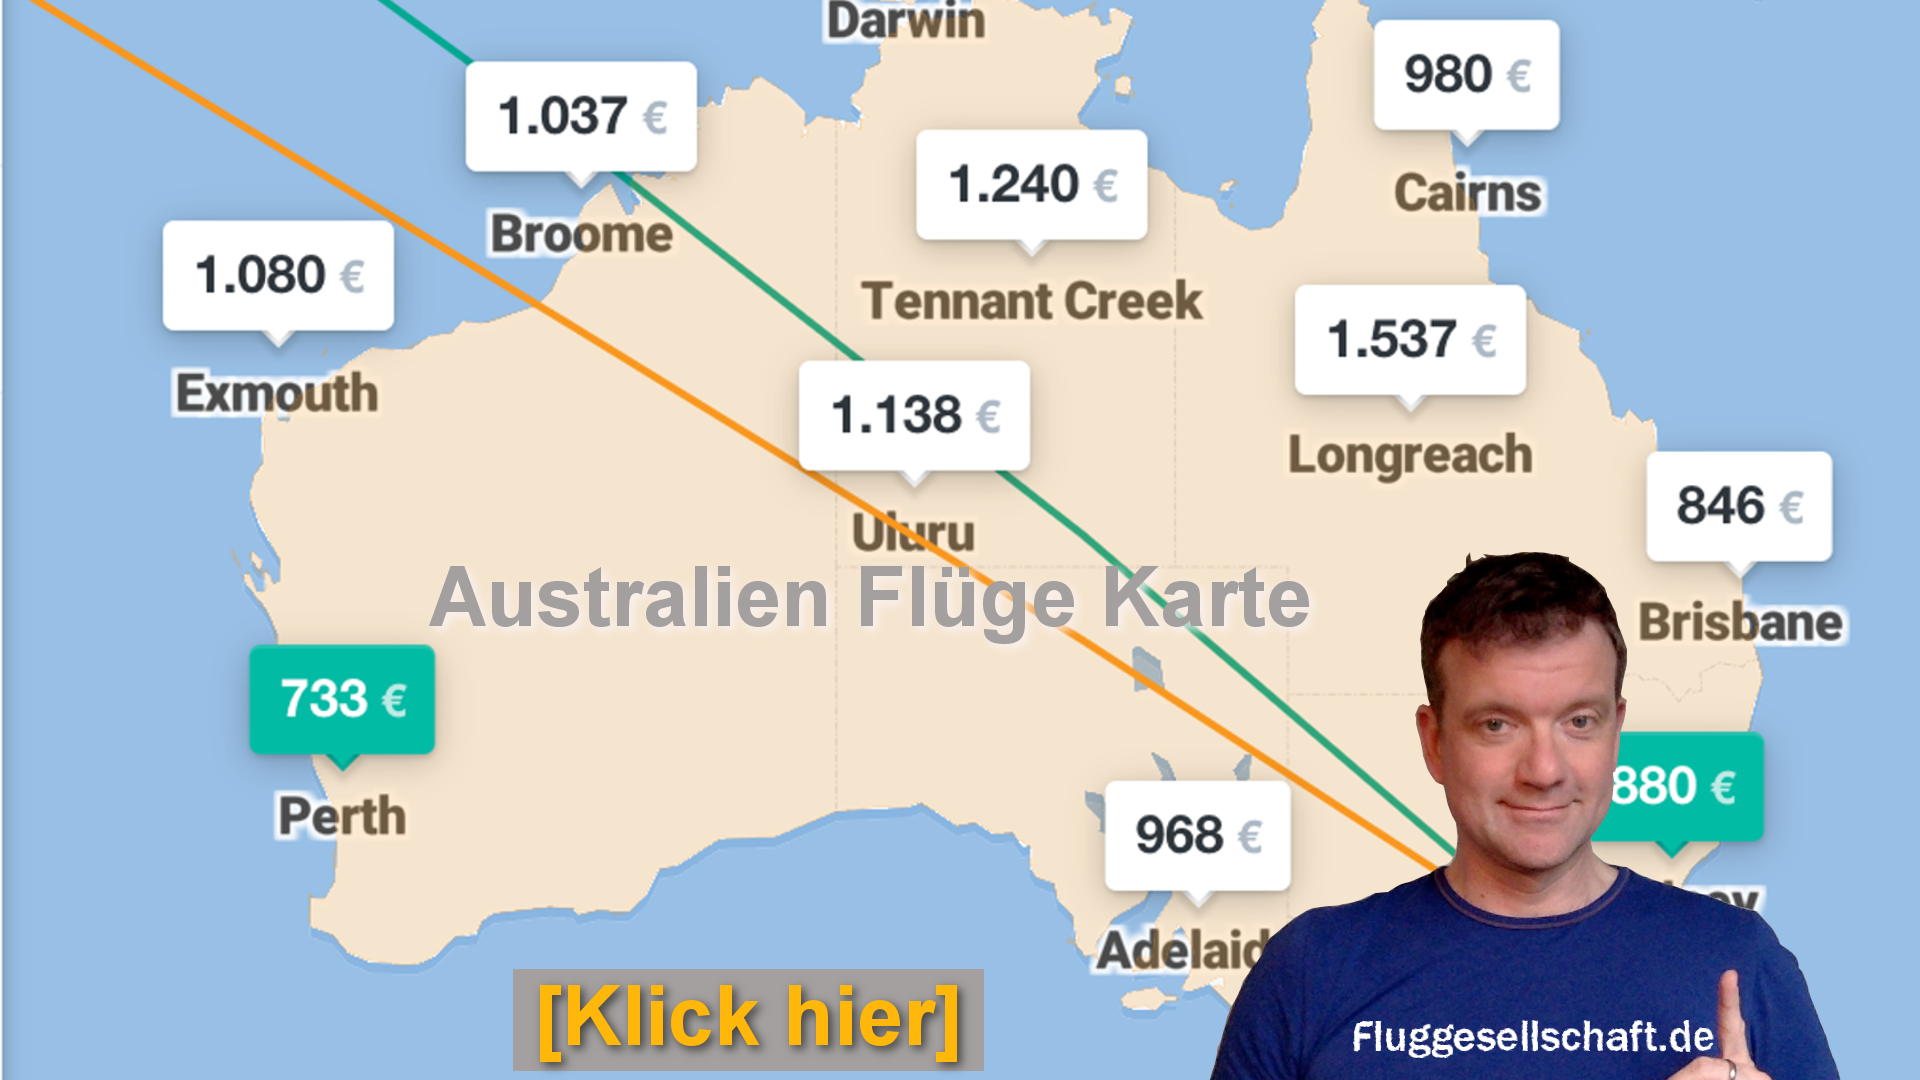 Flugrouten Karte Weltweit Lufthansa.Fluge Flughafen Perth Fluggesellschaft De